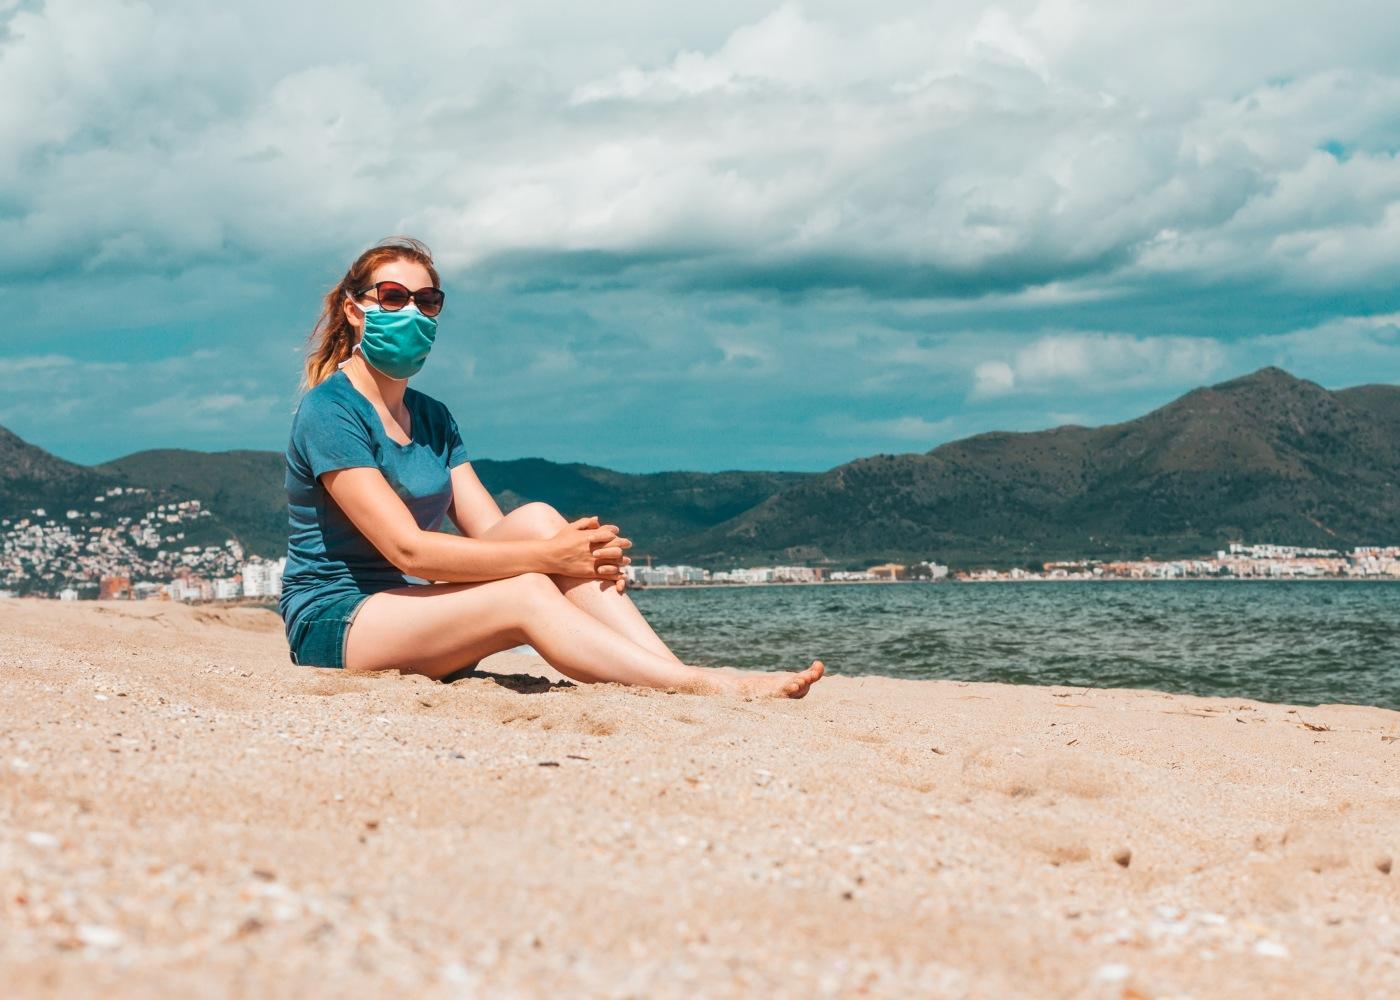 mulher com máscara sentada no areal